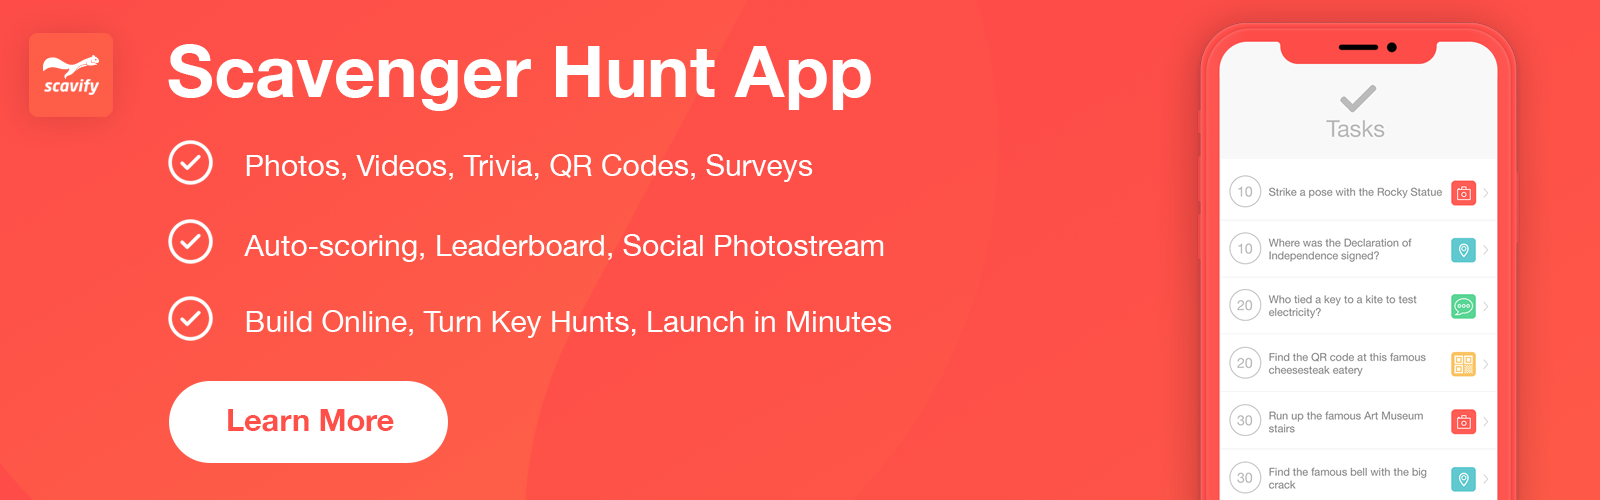 Scavenger Hunt Team Building Activity For Work